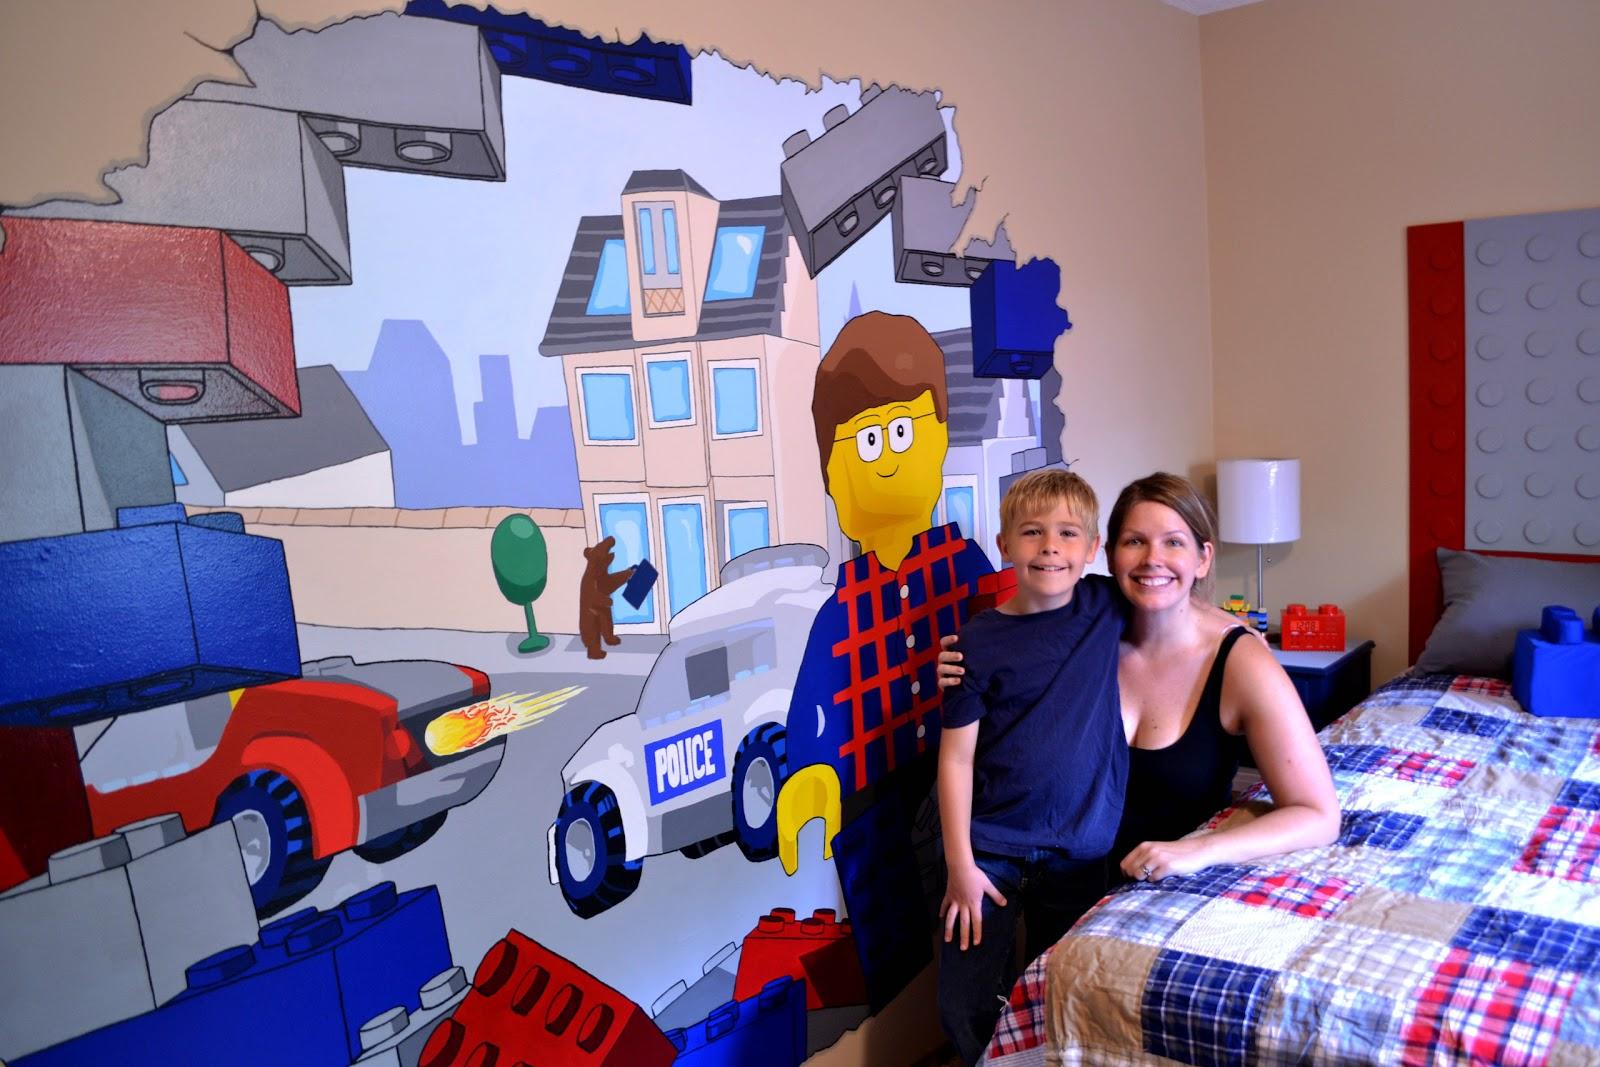 Lego Accessories For Bedroom Similiar Lego Bedroom Accessories Keywords